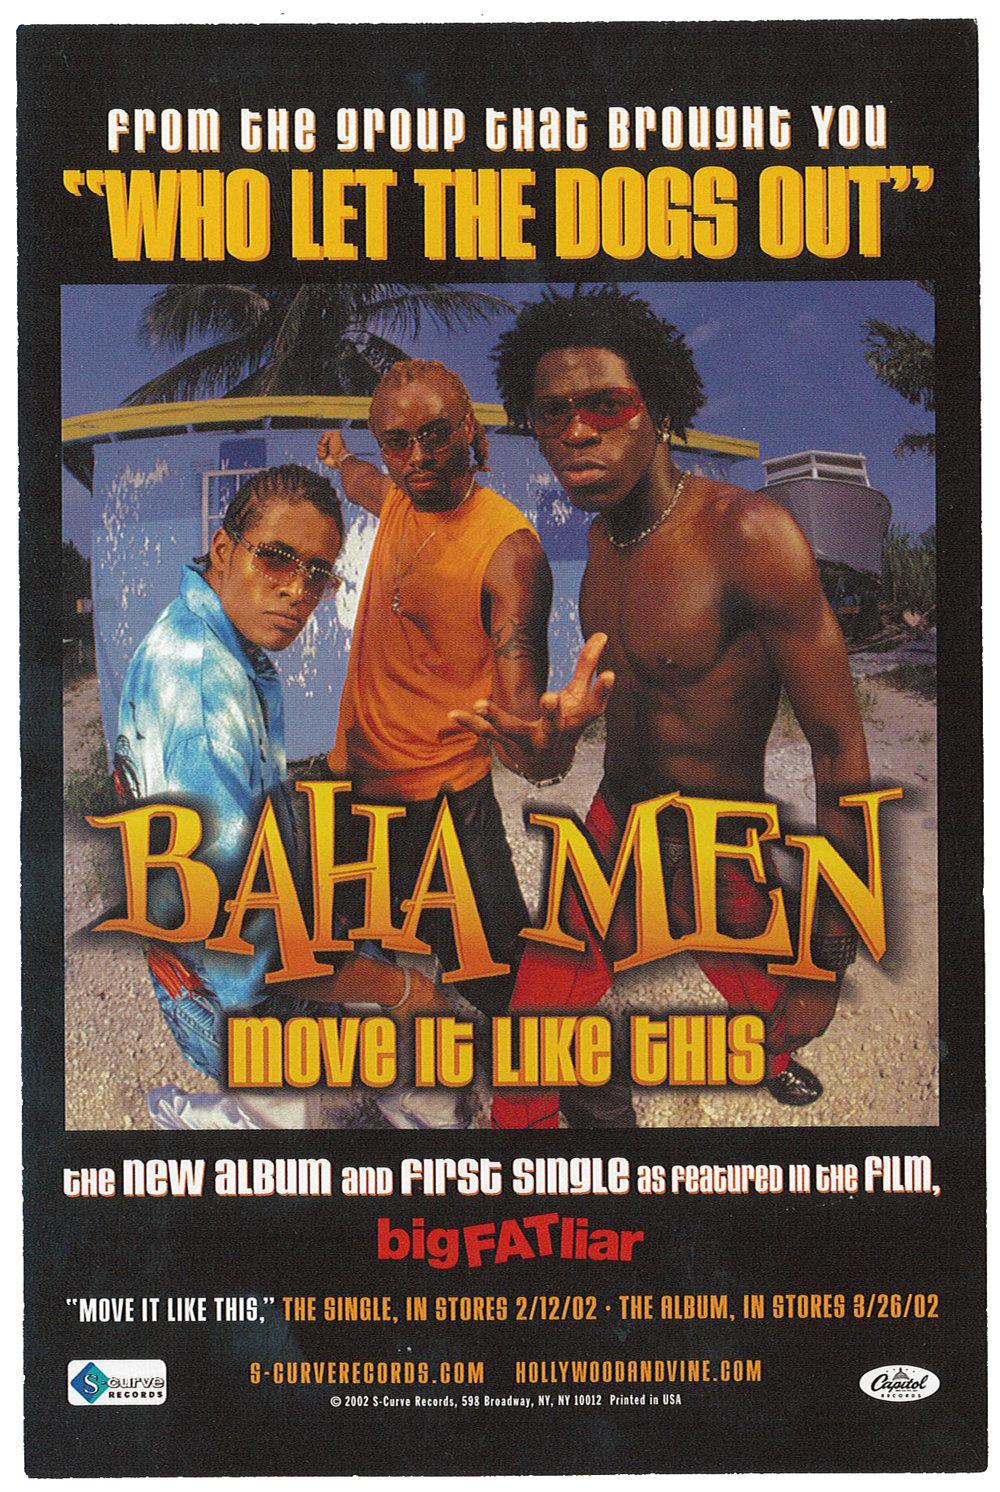 WLWLTDOO-2002-PRINT-BAHA_MEN-MOVE_IT-PROMO_CARD-FRONT.jpg